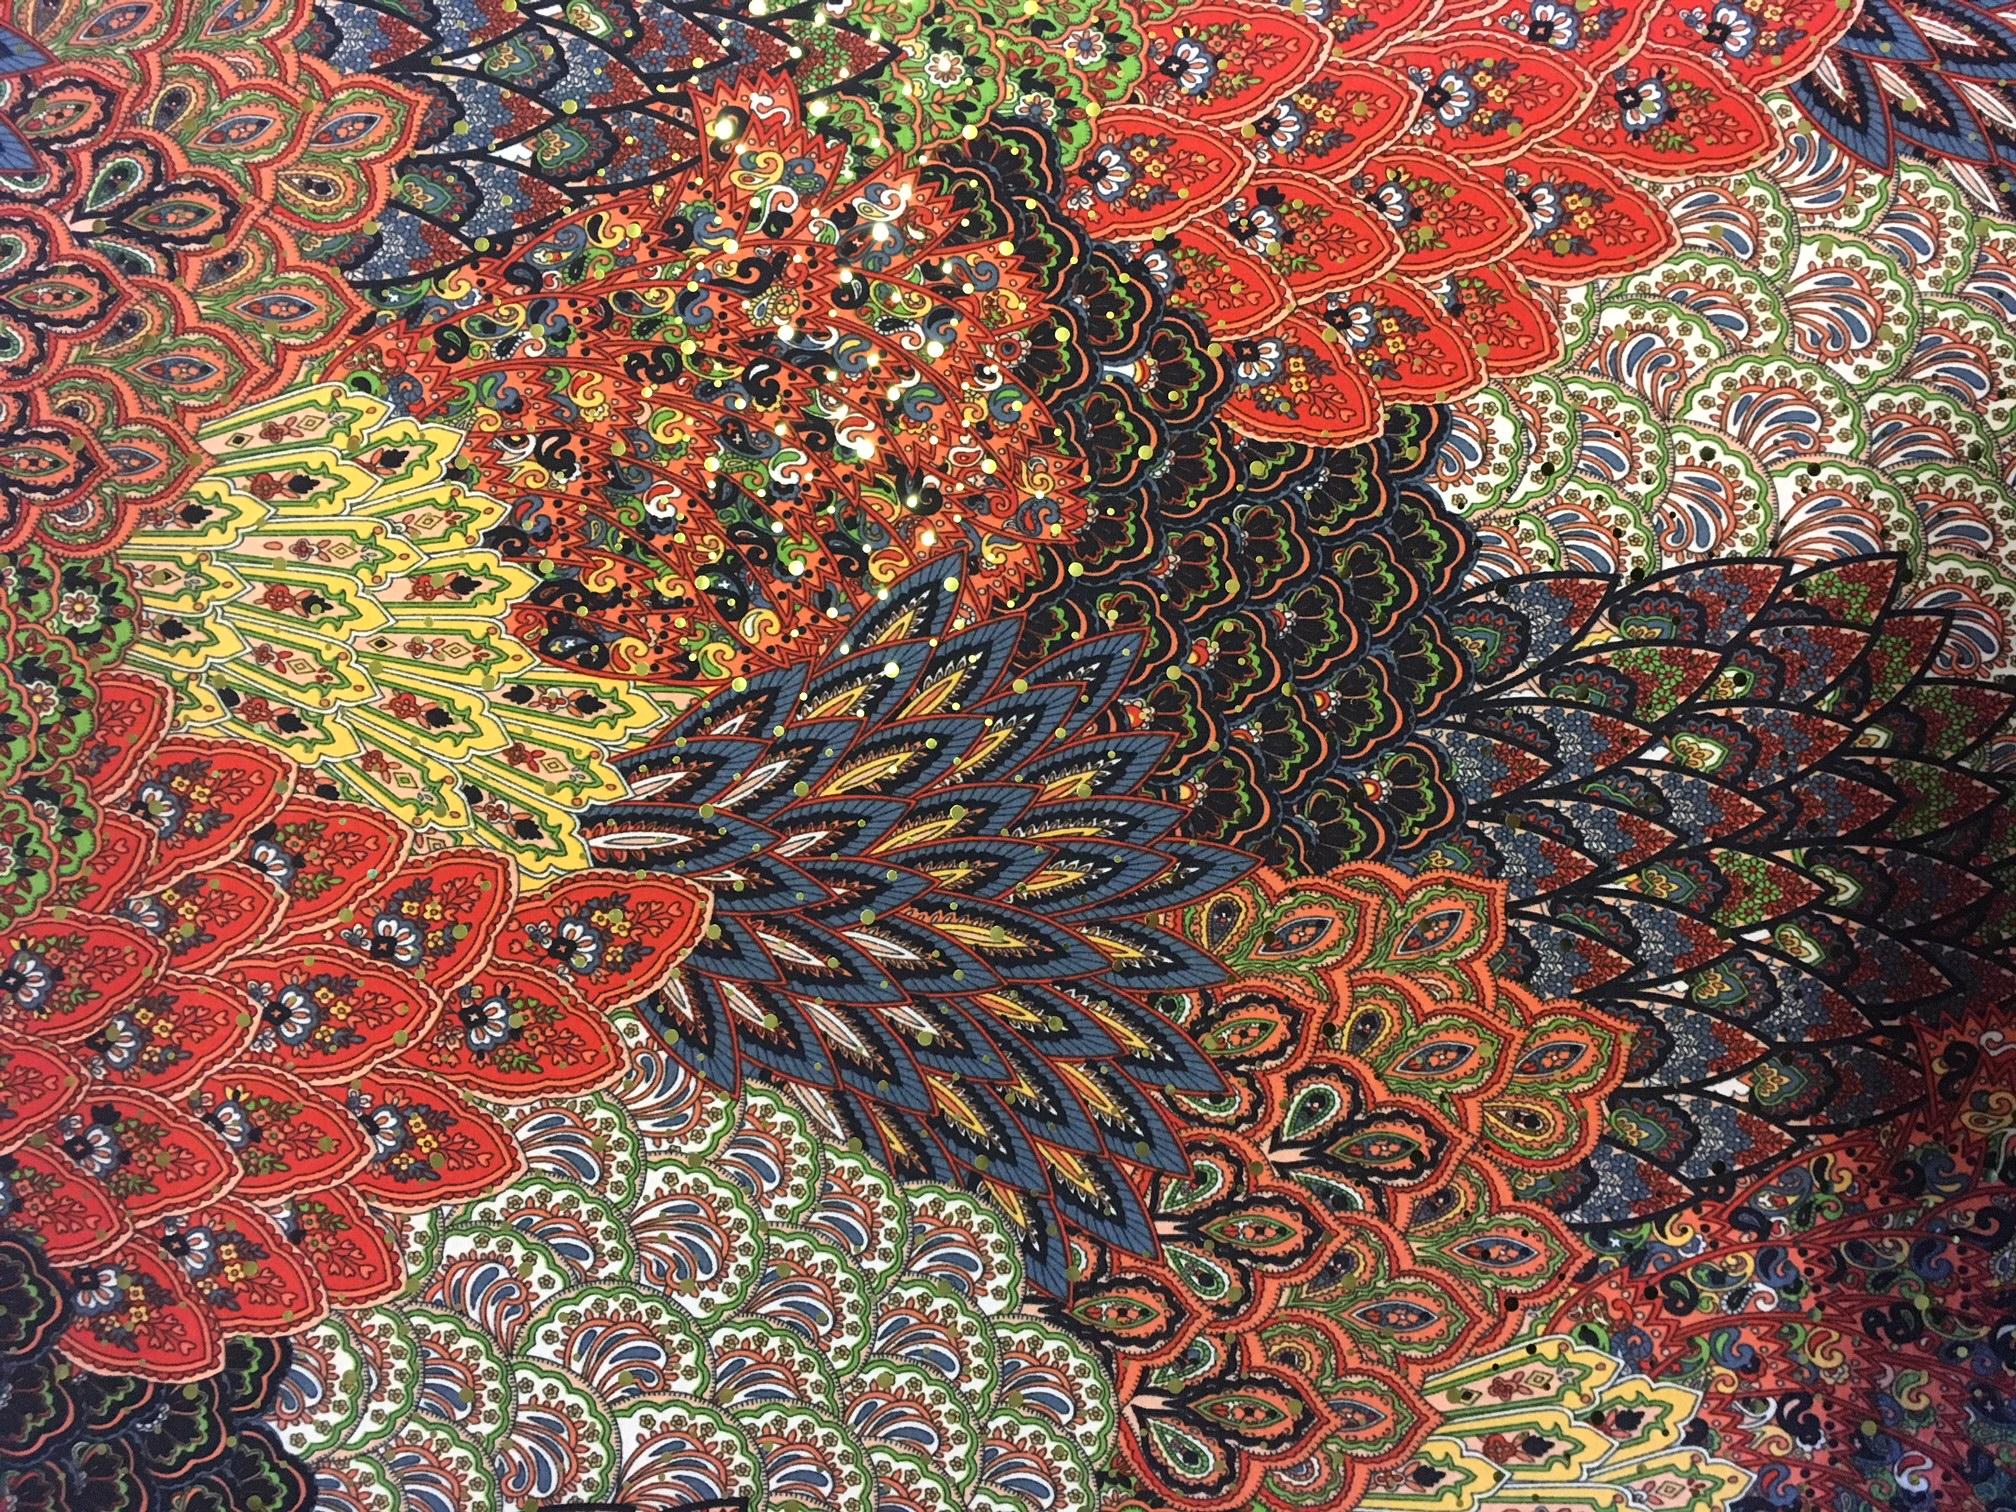 Autumn Harvest (holographic sequins)